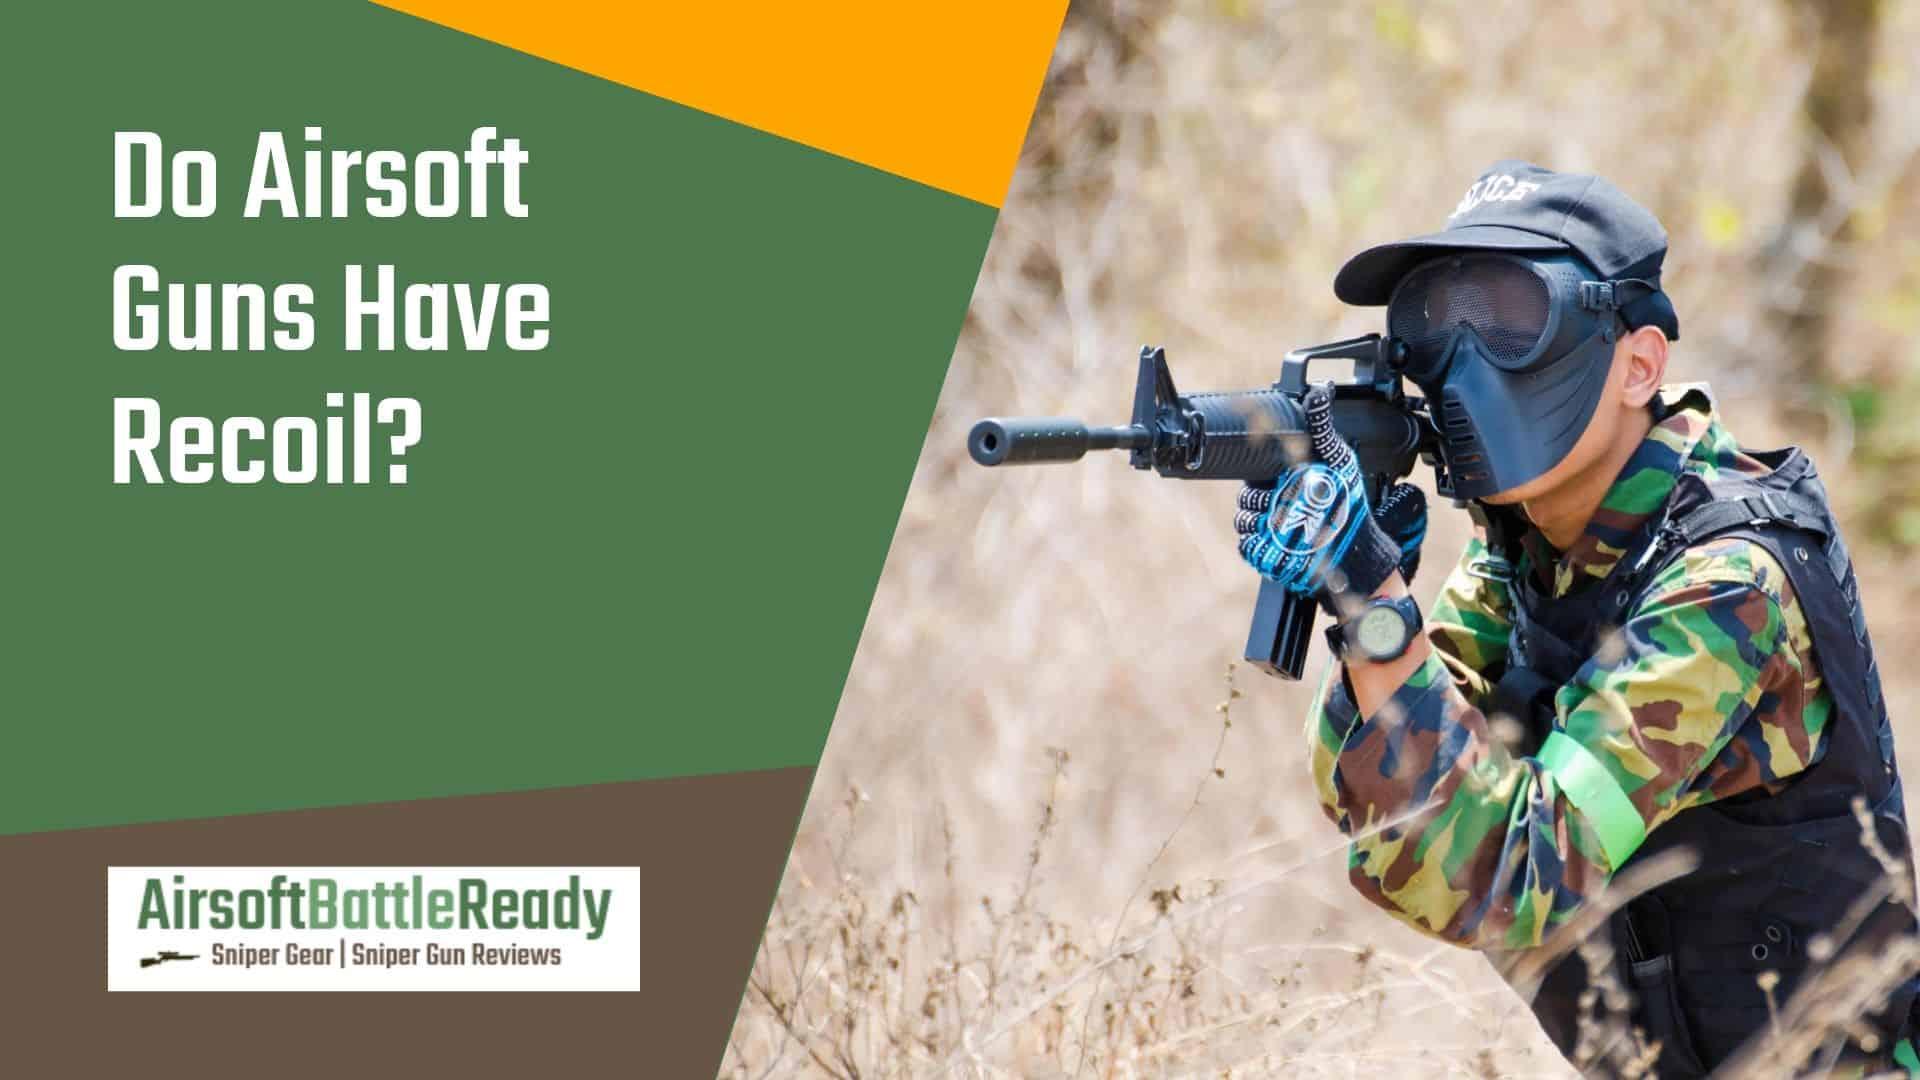 Do Airsoft Guns Have Recoil Airsoft Battle Ready